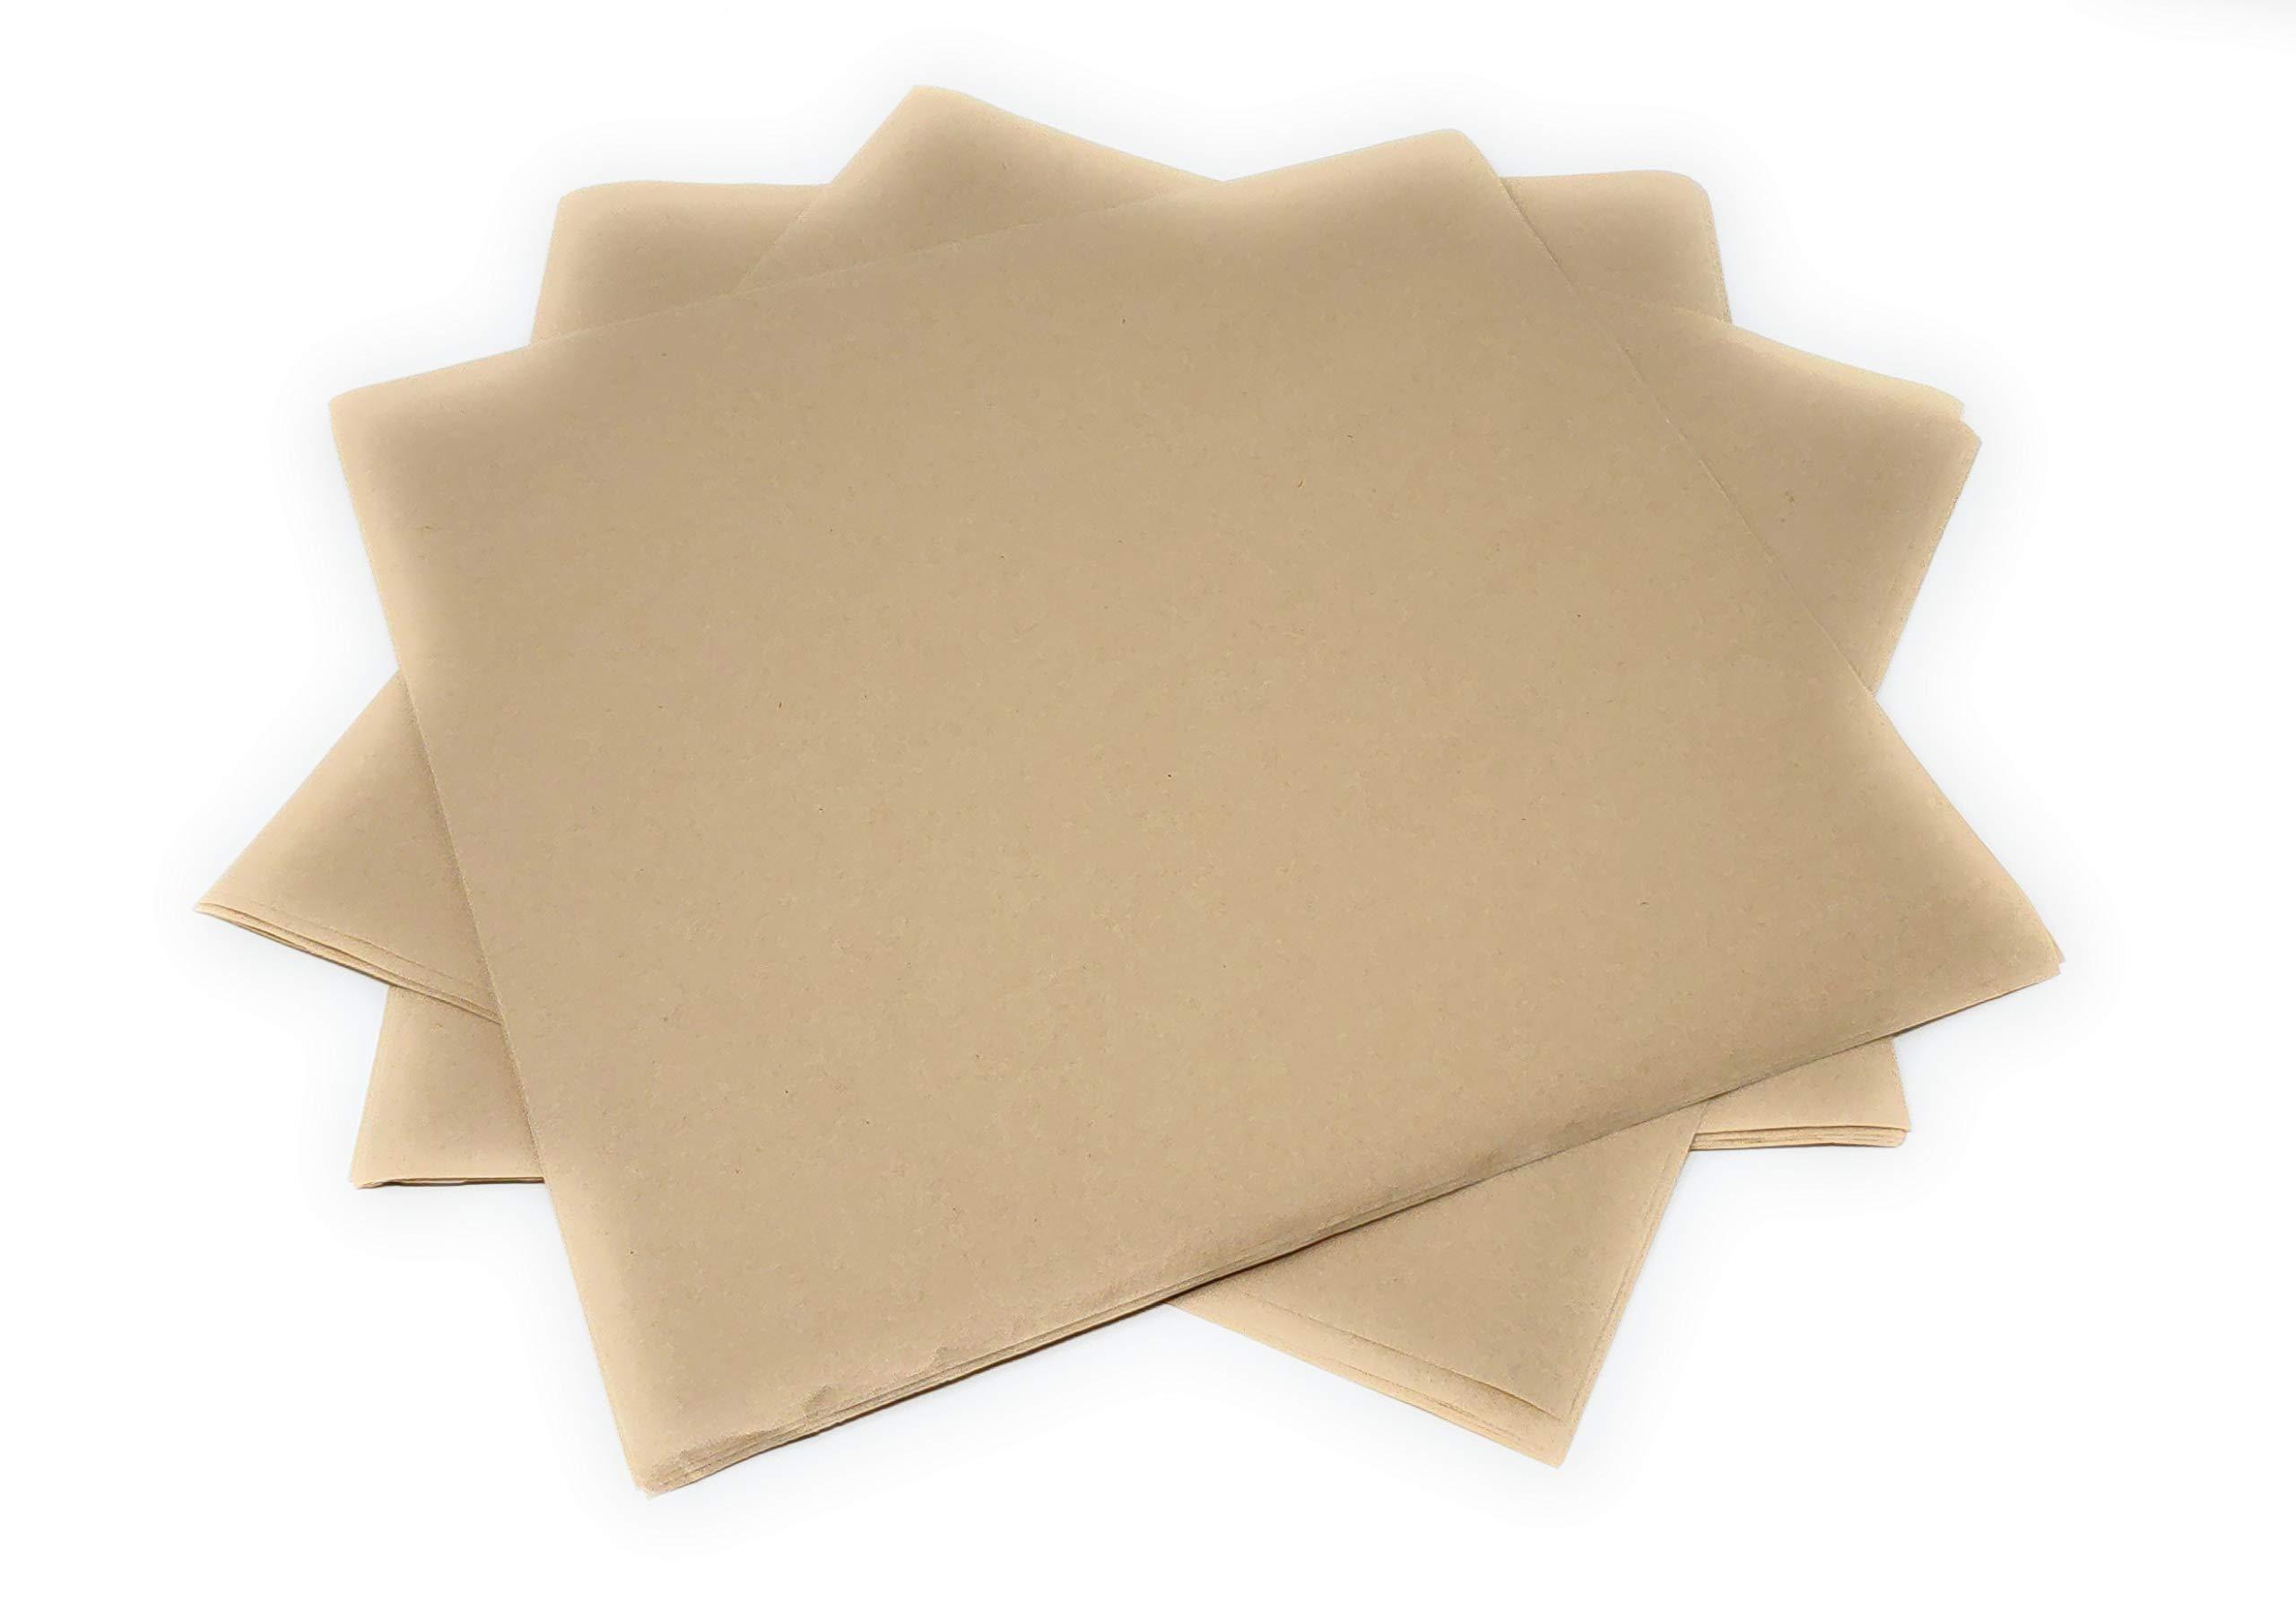 Deli Paper Sheets In Squares Of 12'' x 12'', 250 Natural Kraft Food Deli Sheets